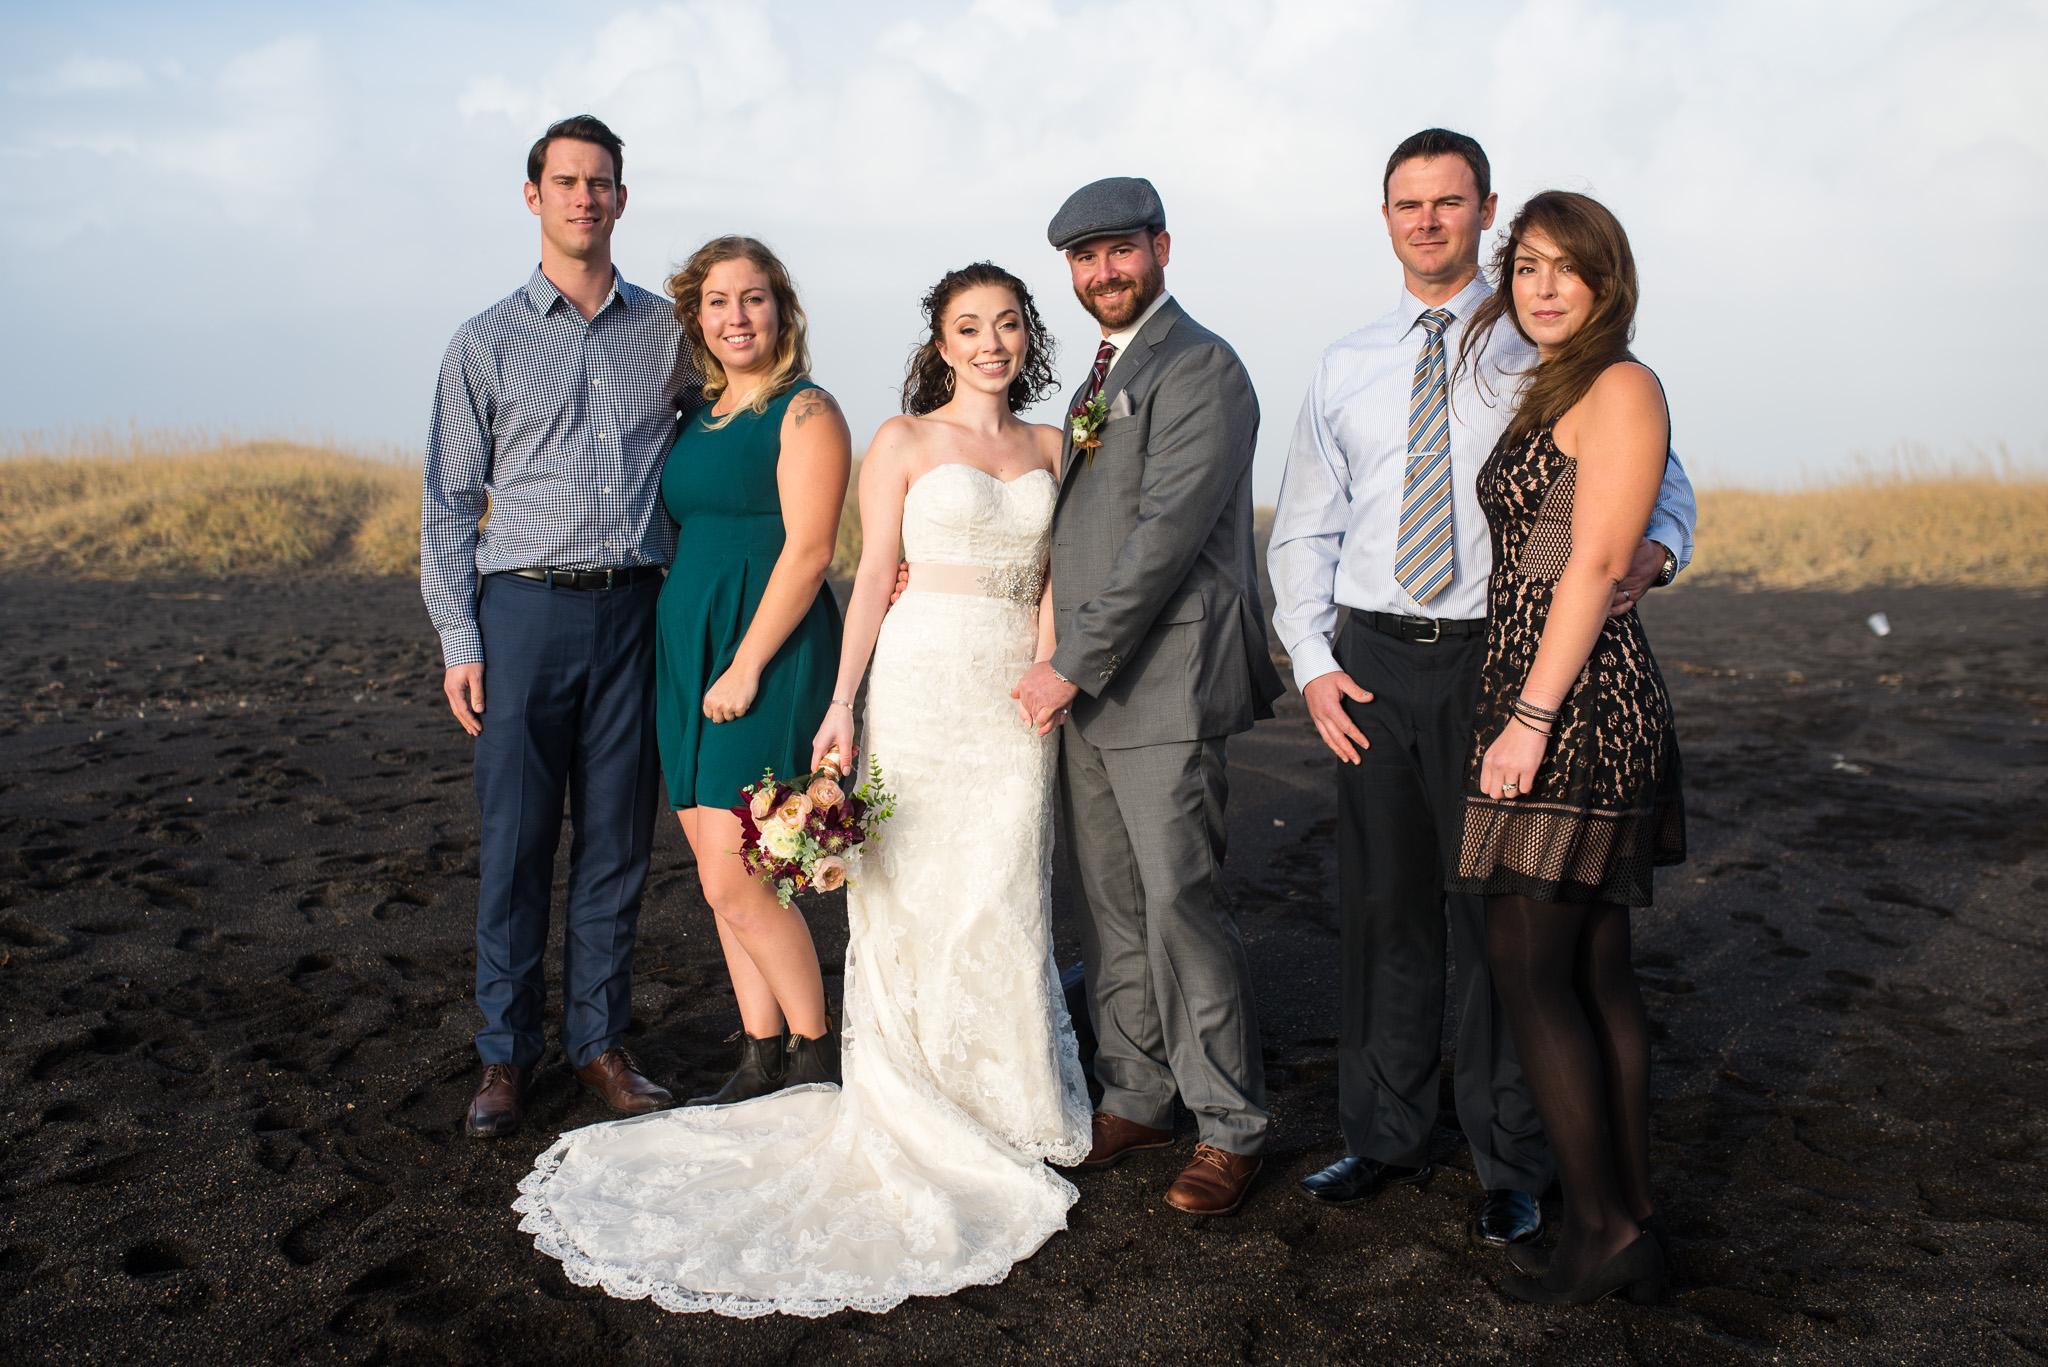 reykjavik-elopement-iceland-reykjanes-victoria-wedding-photographers-32.jpg